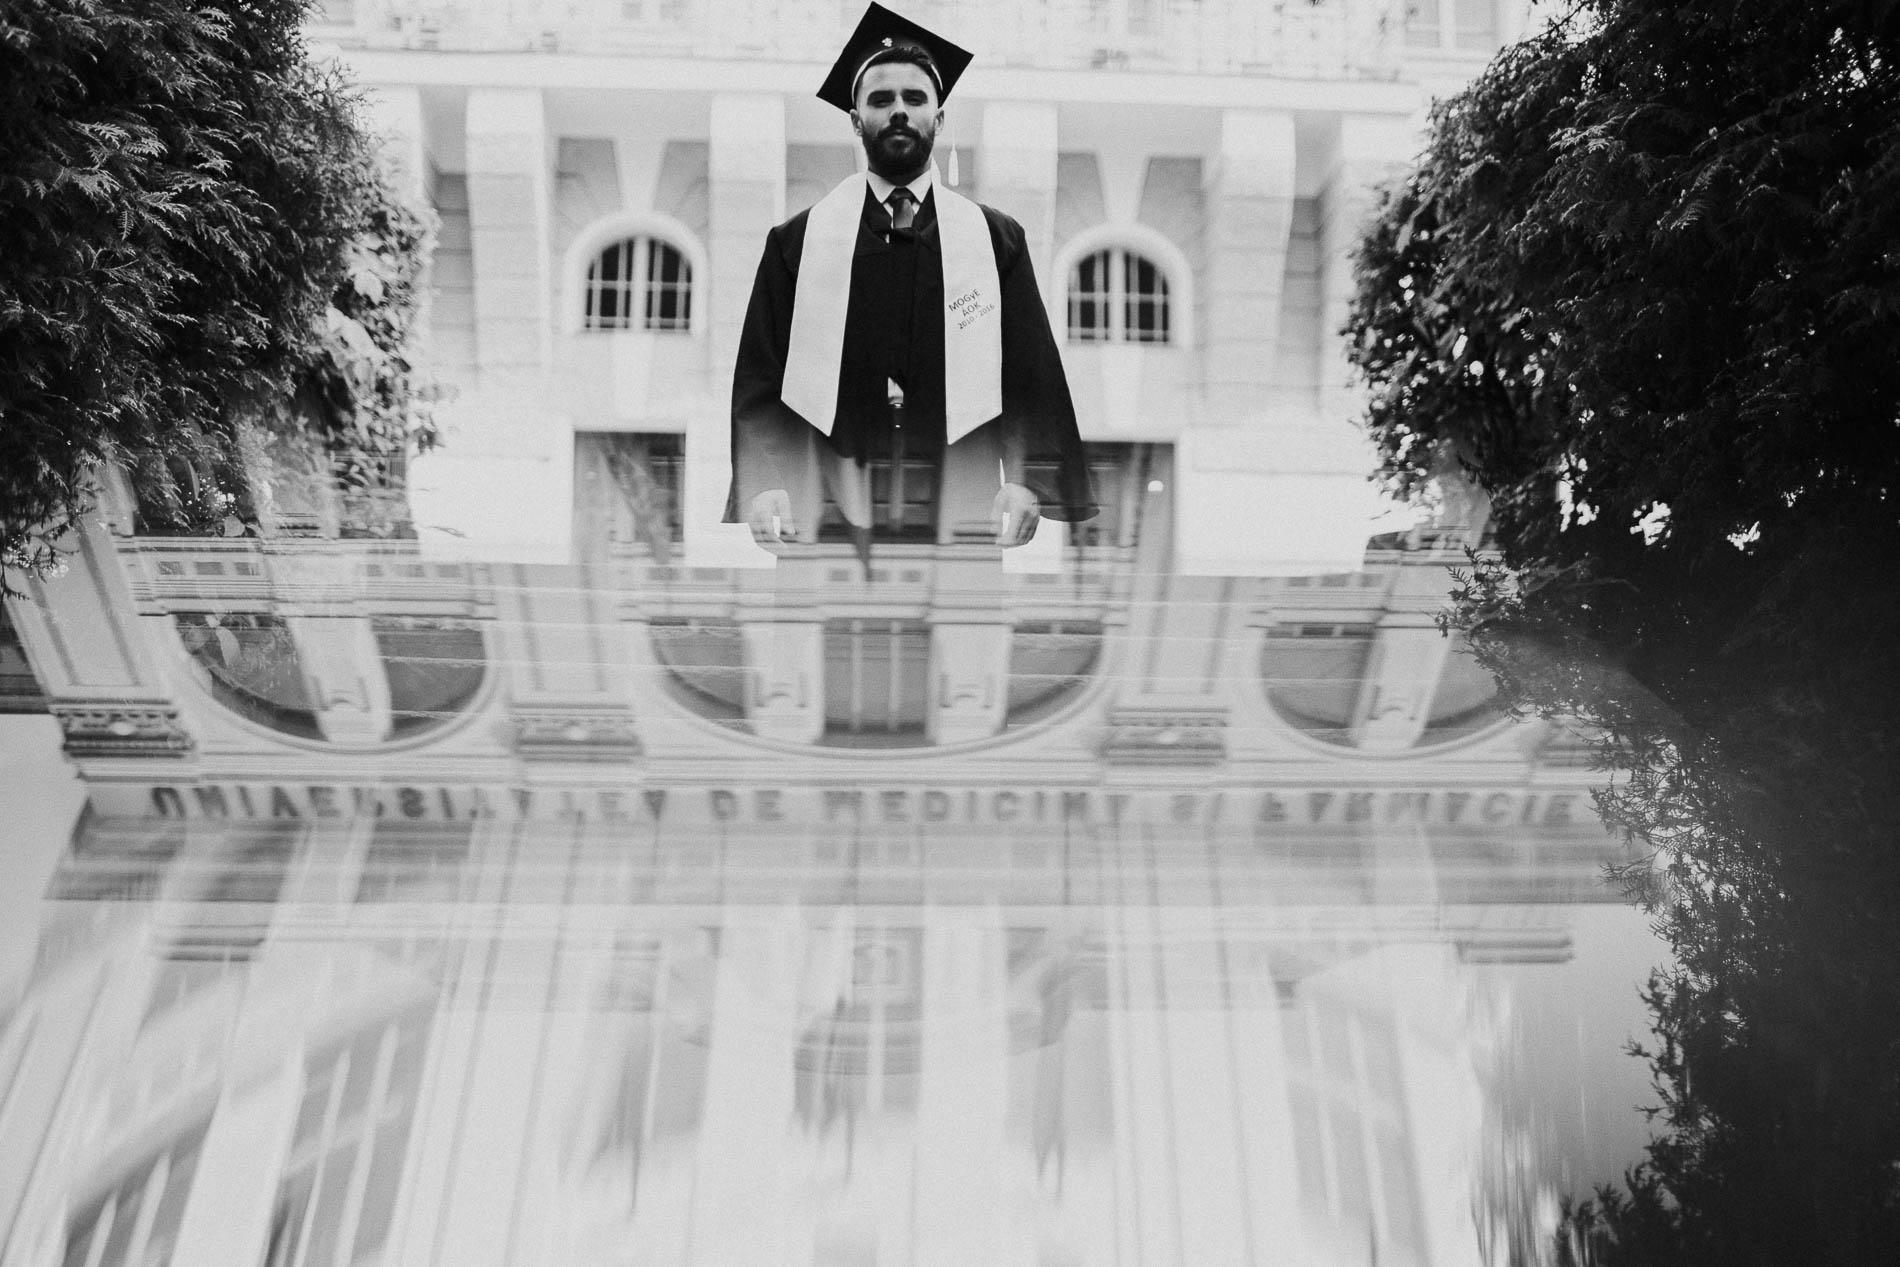 fotografii de absolvire senior portrait foto portret universitatea de medicina si farmacie targu mures5